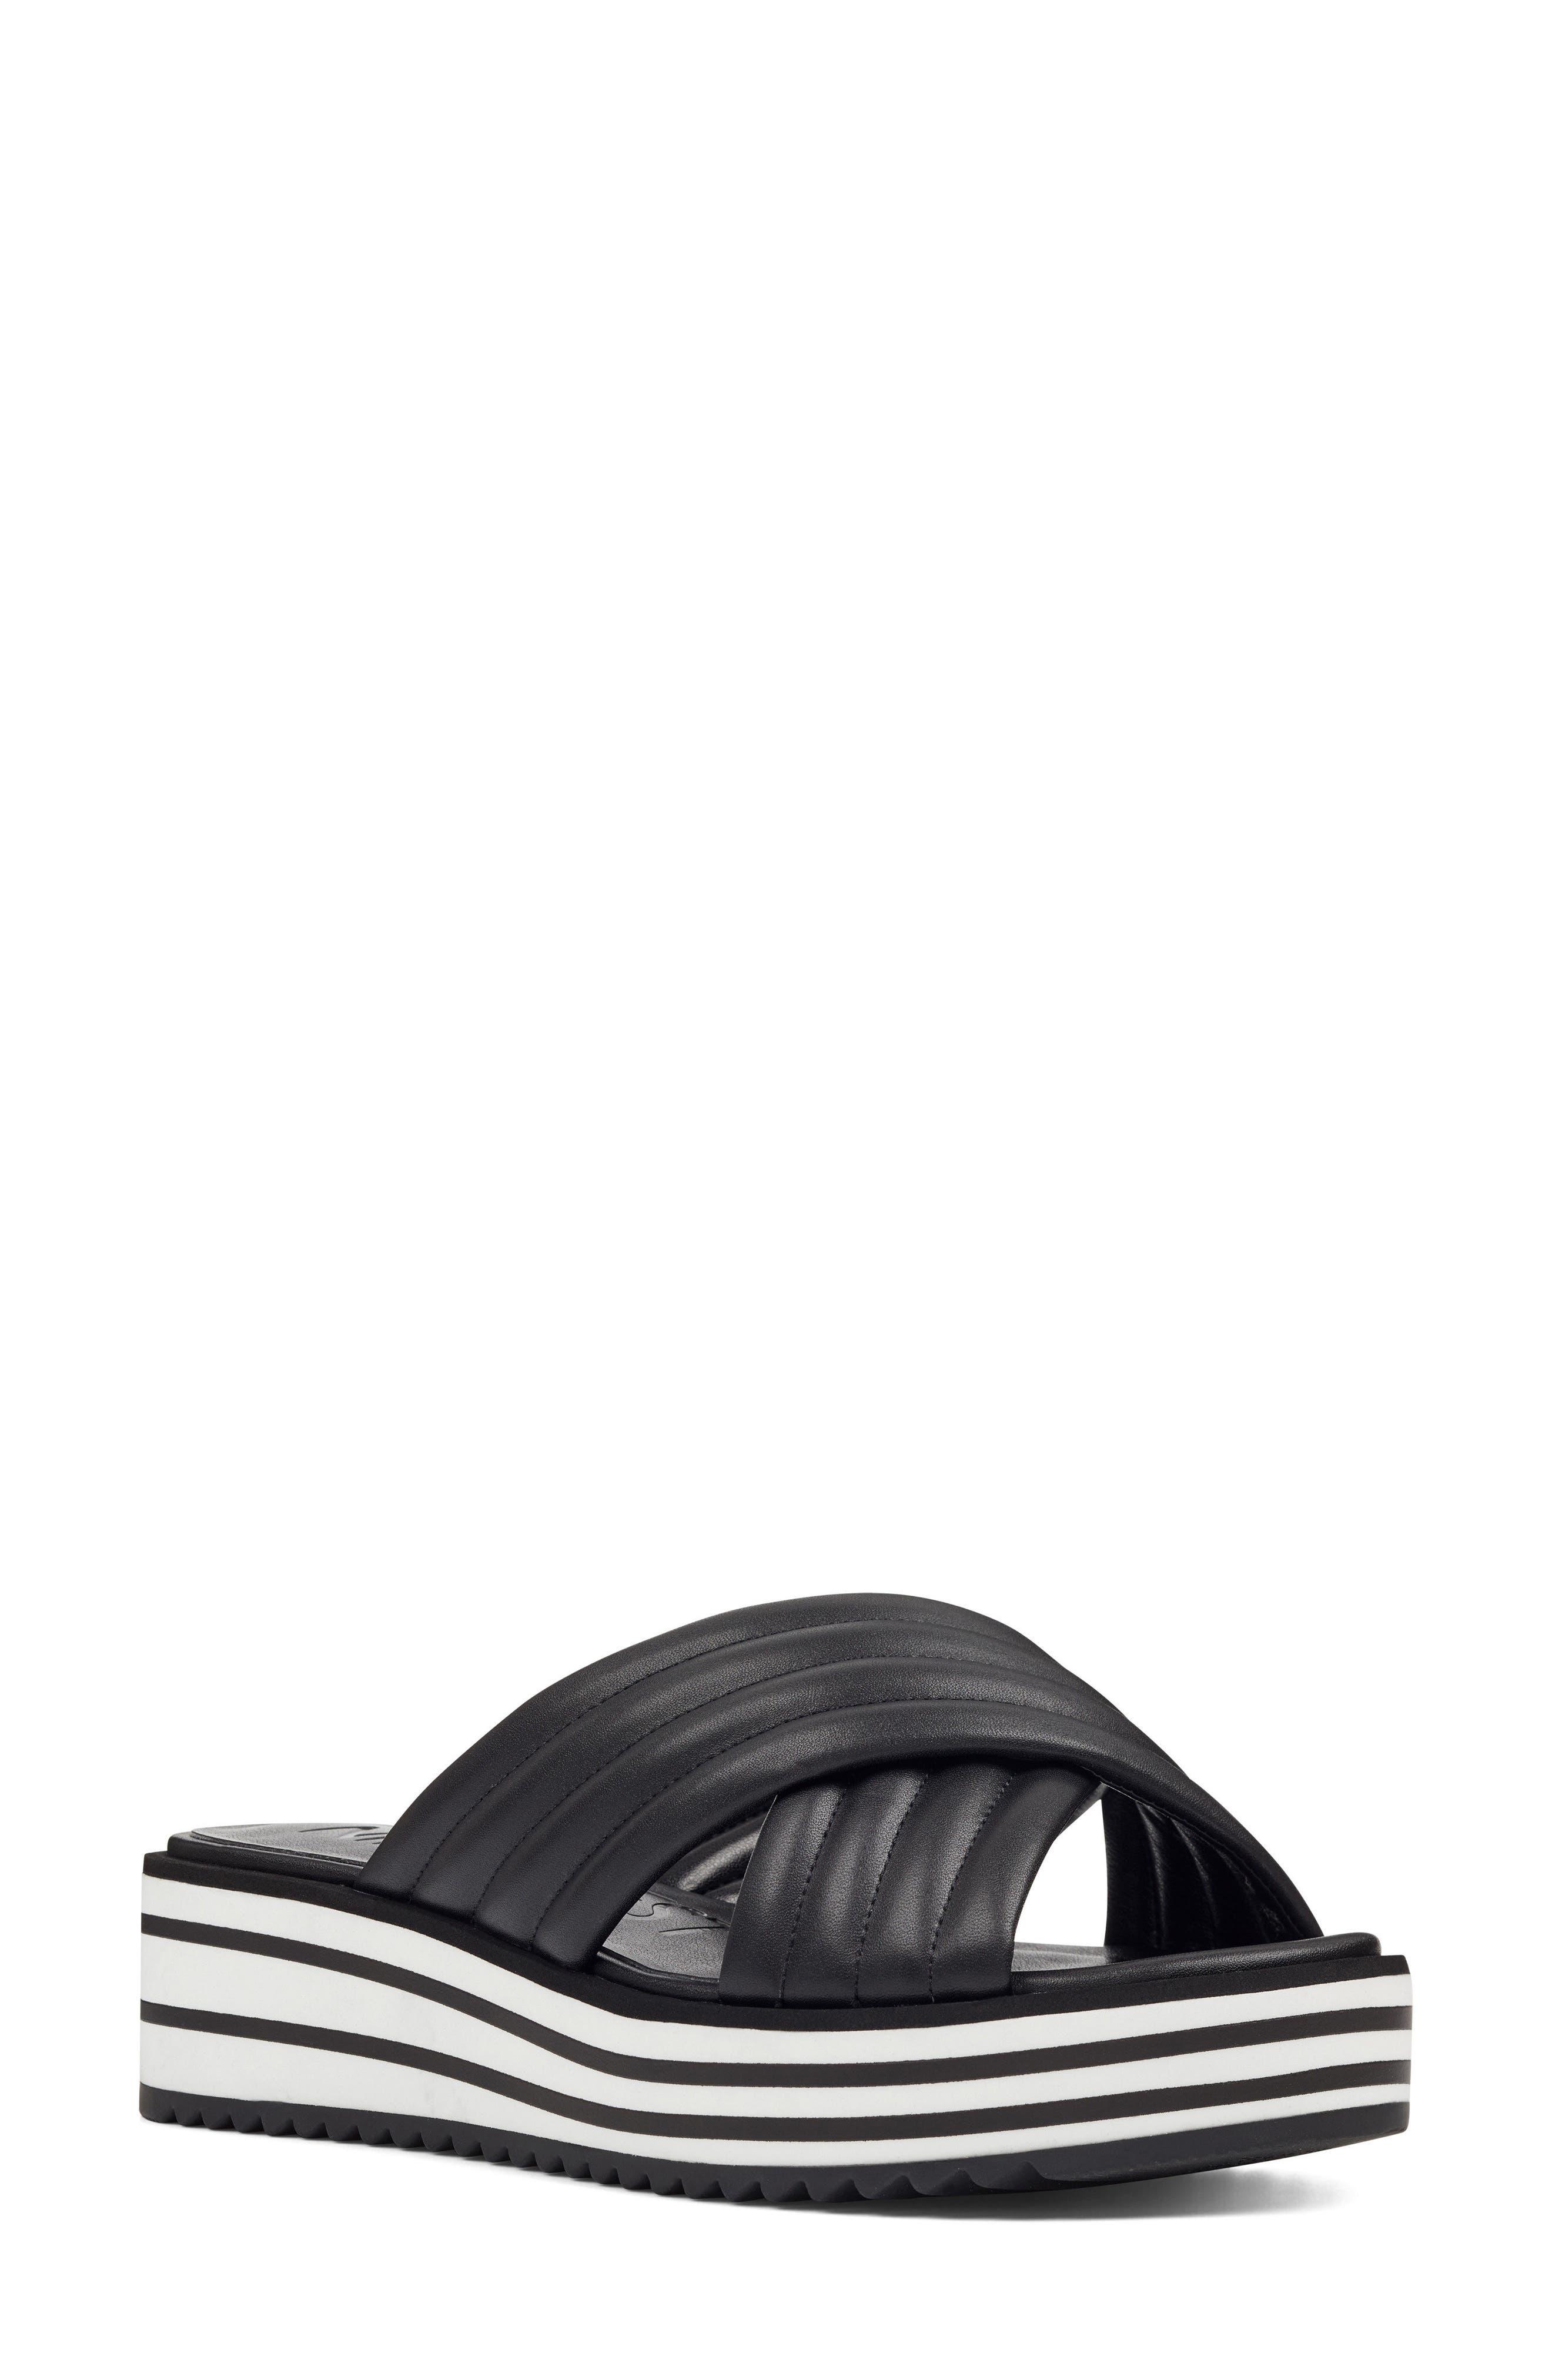 Zonita Platform Slide Sandal,                             Main thumbnail 1, color,                             001